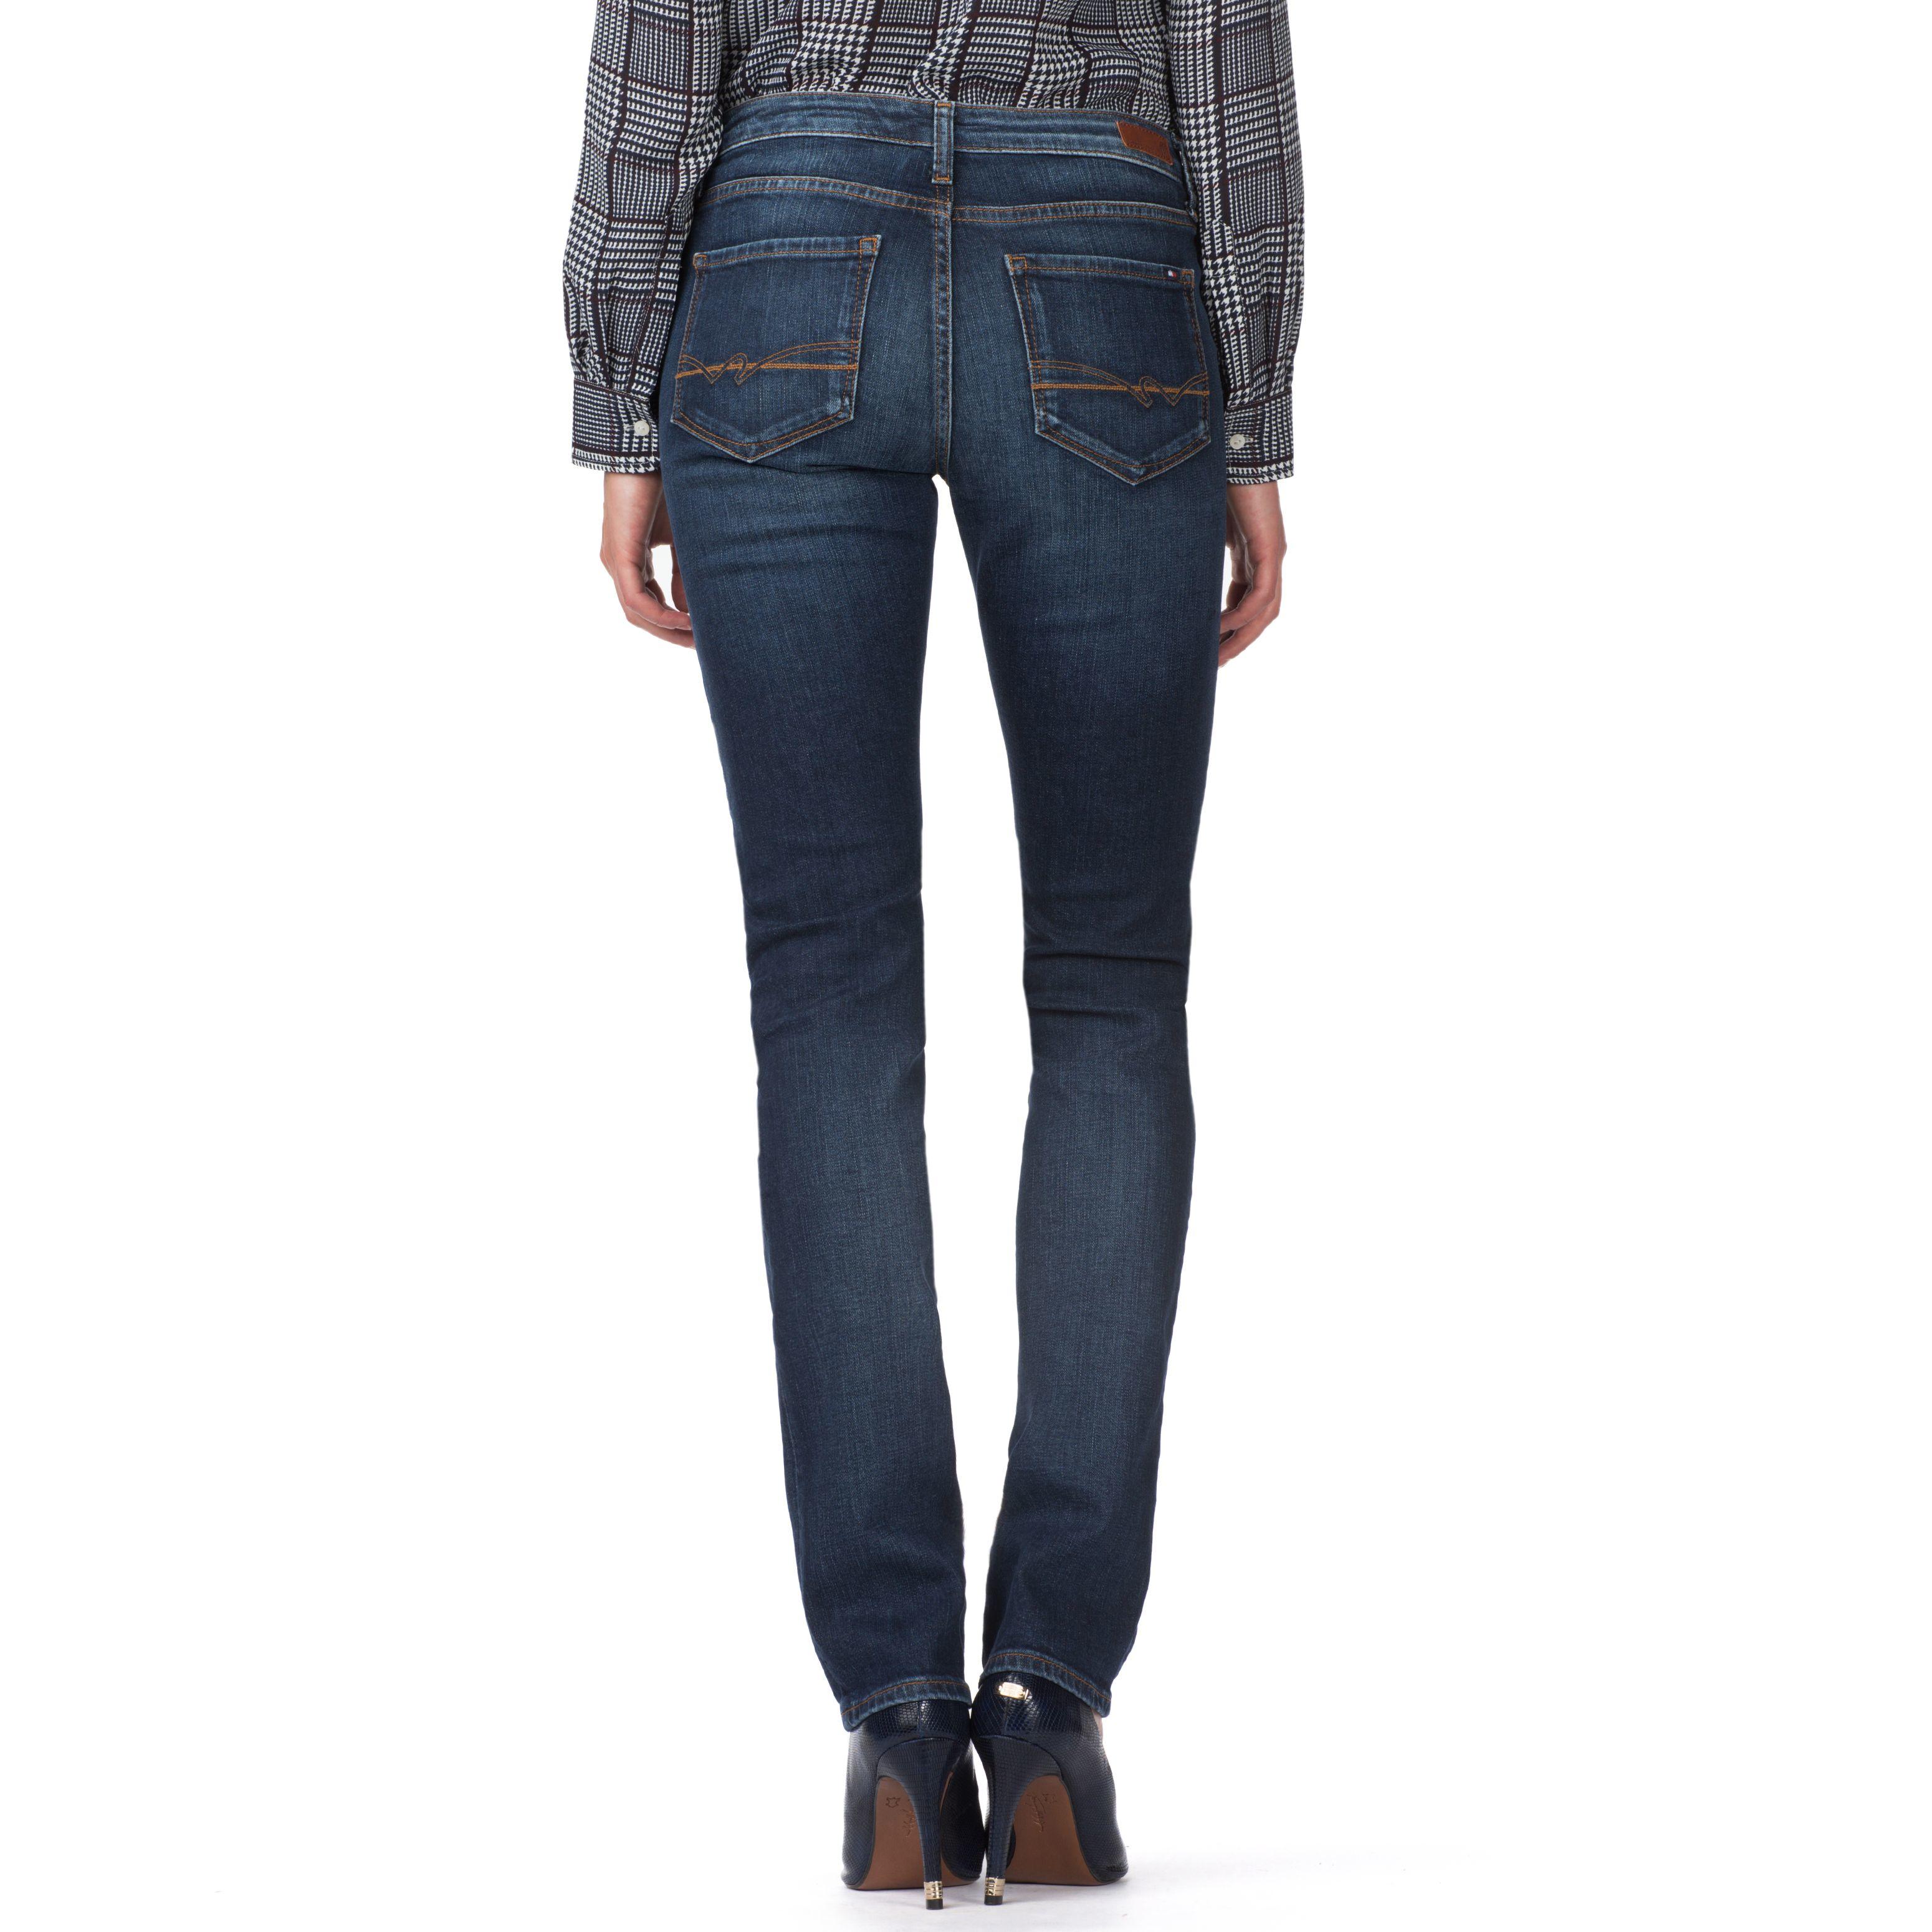 tommy hilfiger rome absolute blue jeans in blue lyst. Black Bedroom Furniture Sets. Home Design Ideas